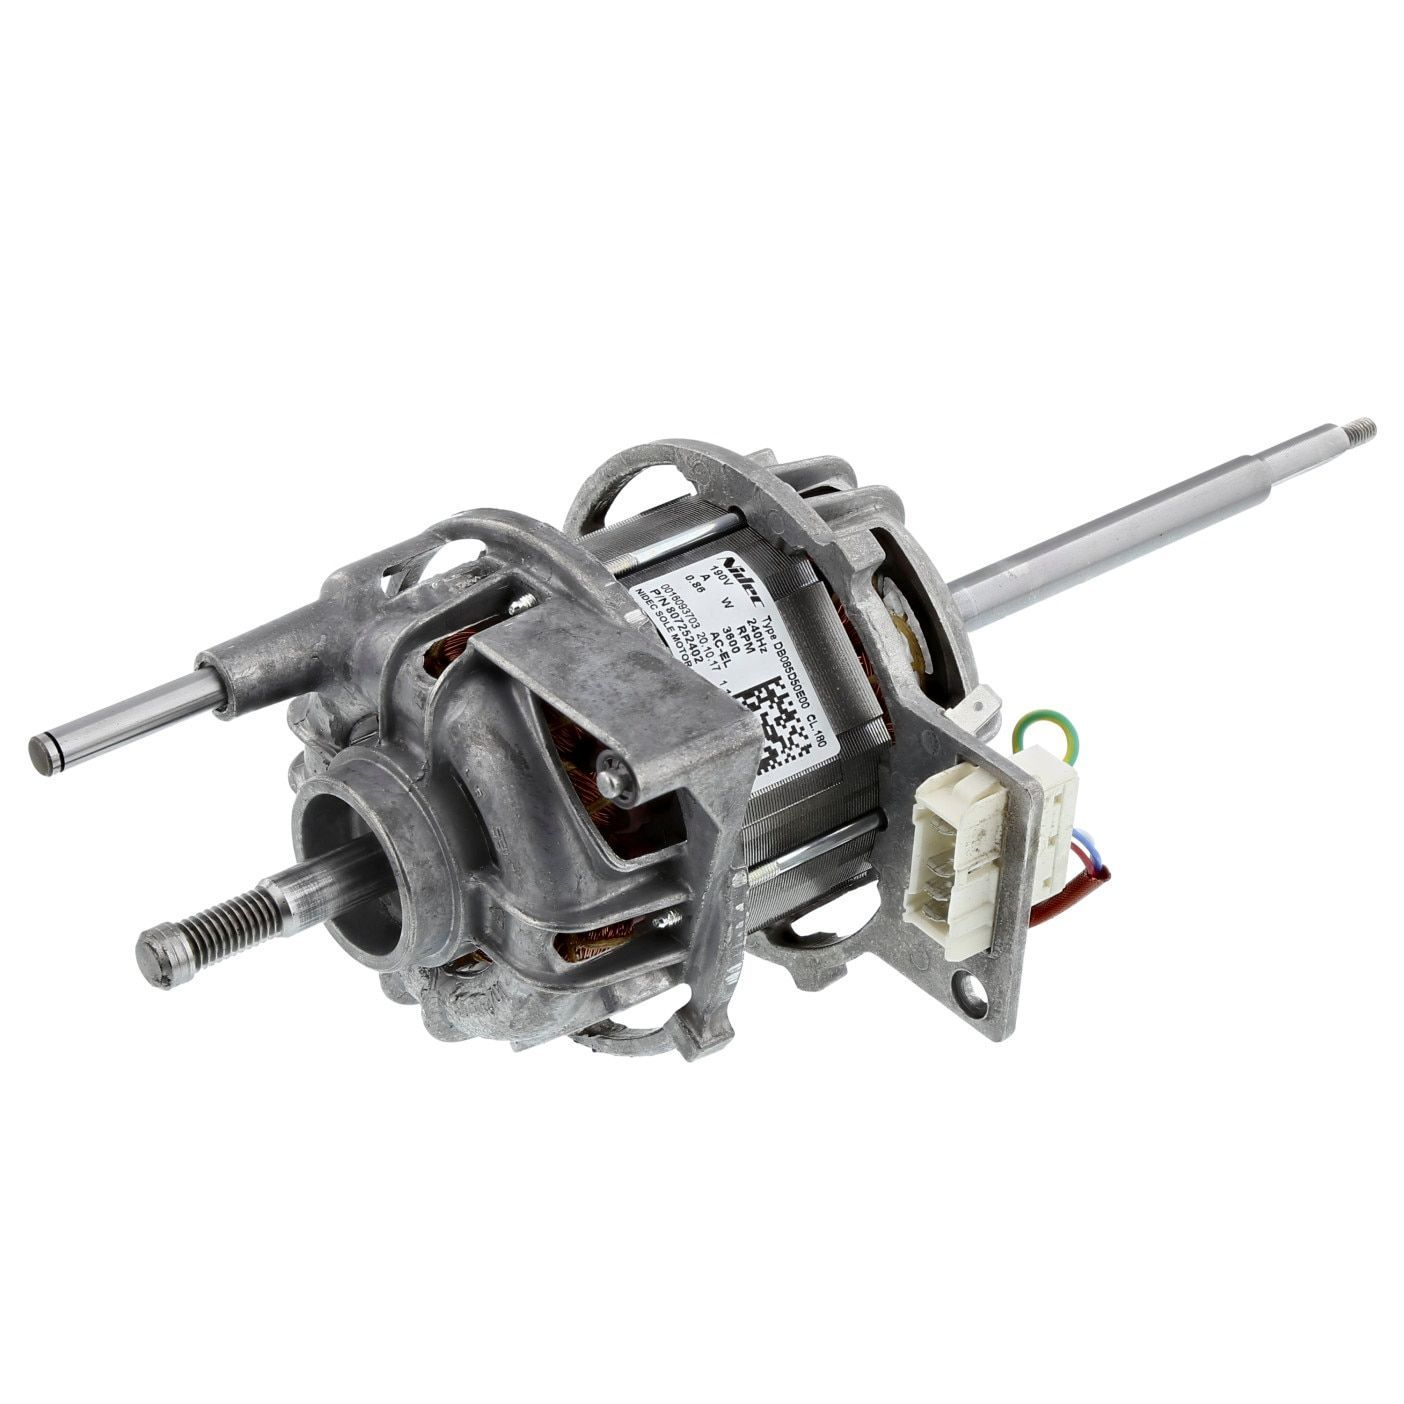 Motor do sušičky AEG Electrolux Zanussi - 8072524021 AEG / Electrolux / Zanussi